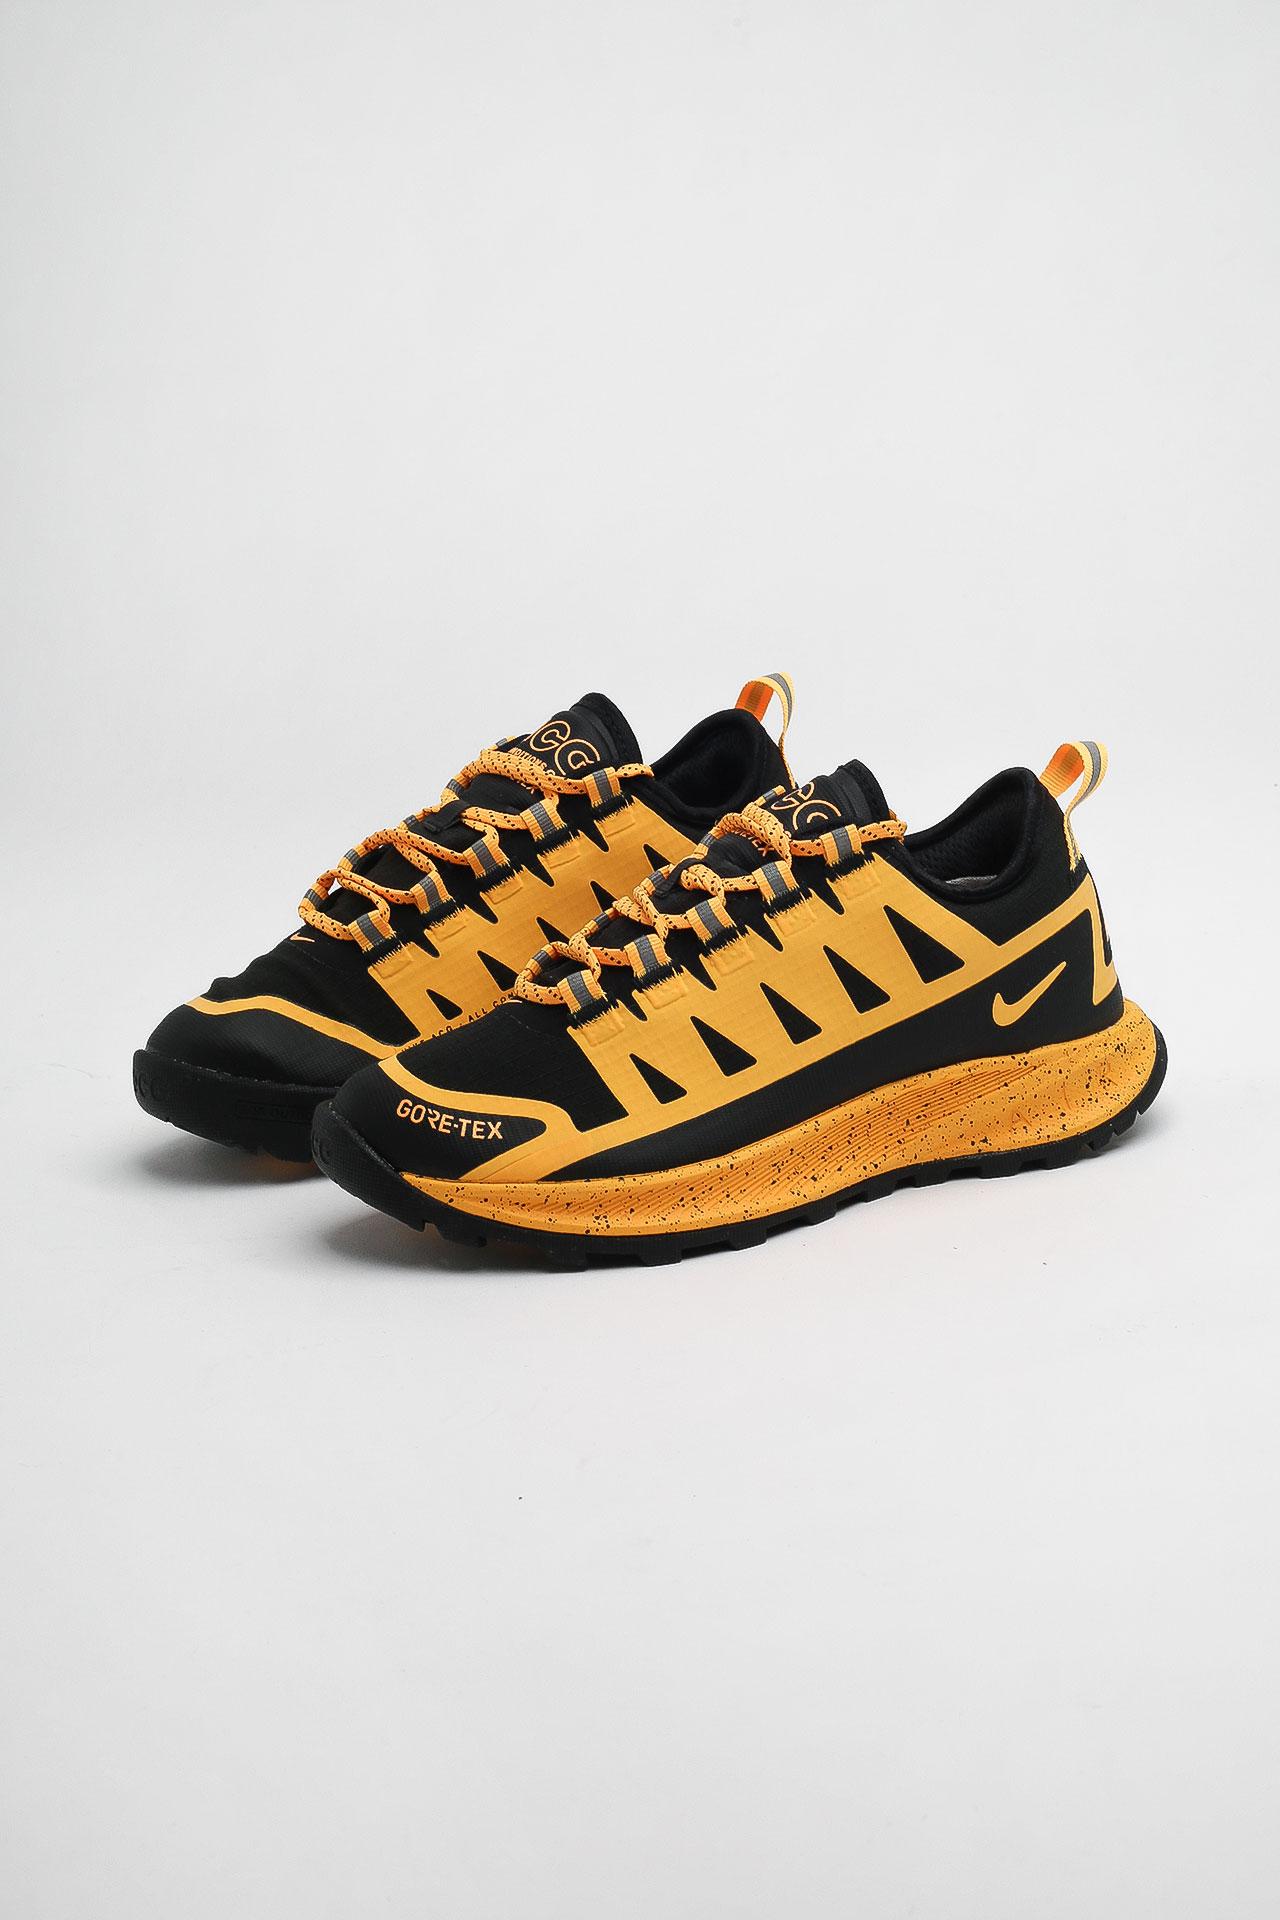 Nike ACG Air Nasu GORE-TEX Laser Orange CW6020-001 Release